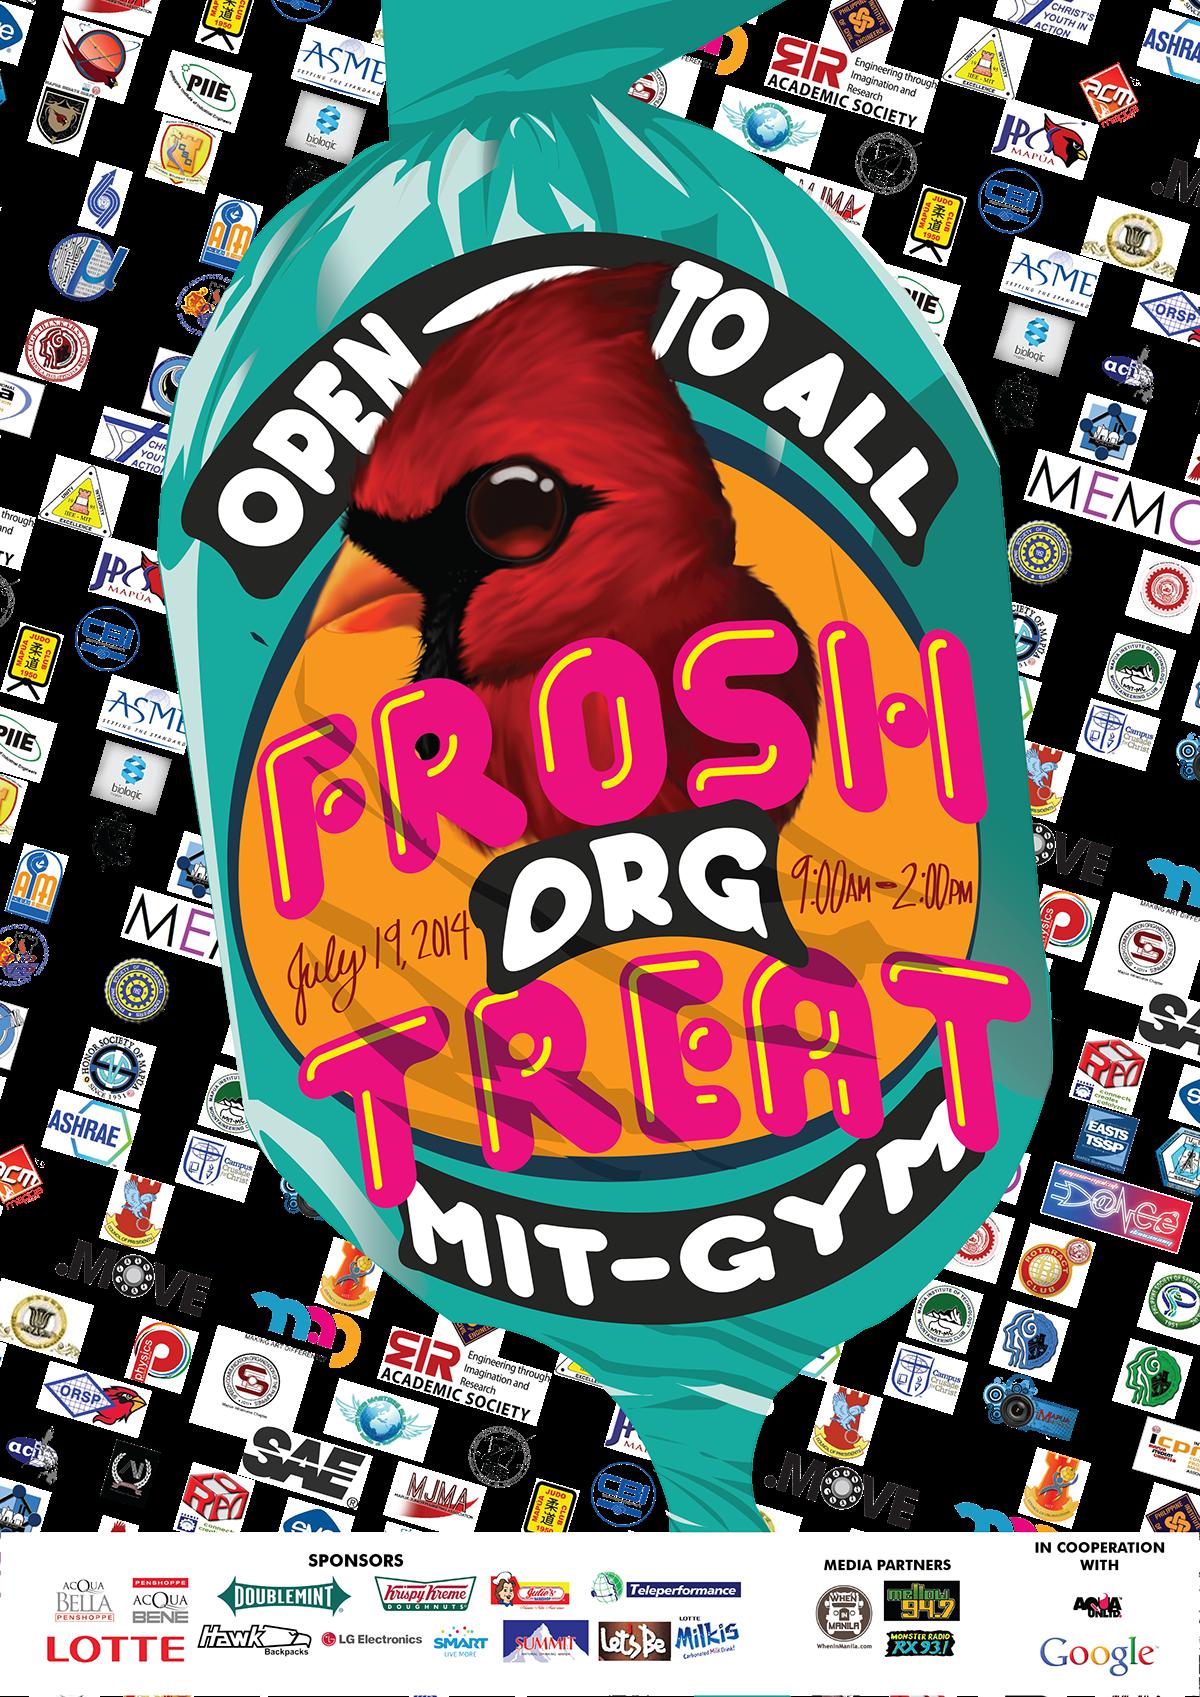 colorful Playful cardinal poster Freshmen Orientation organization